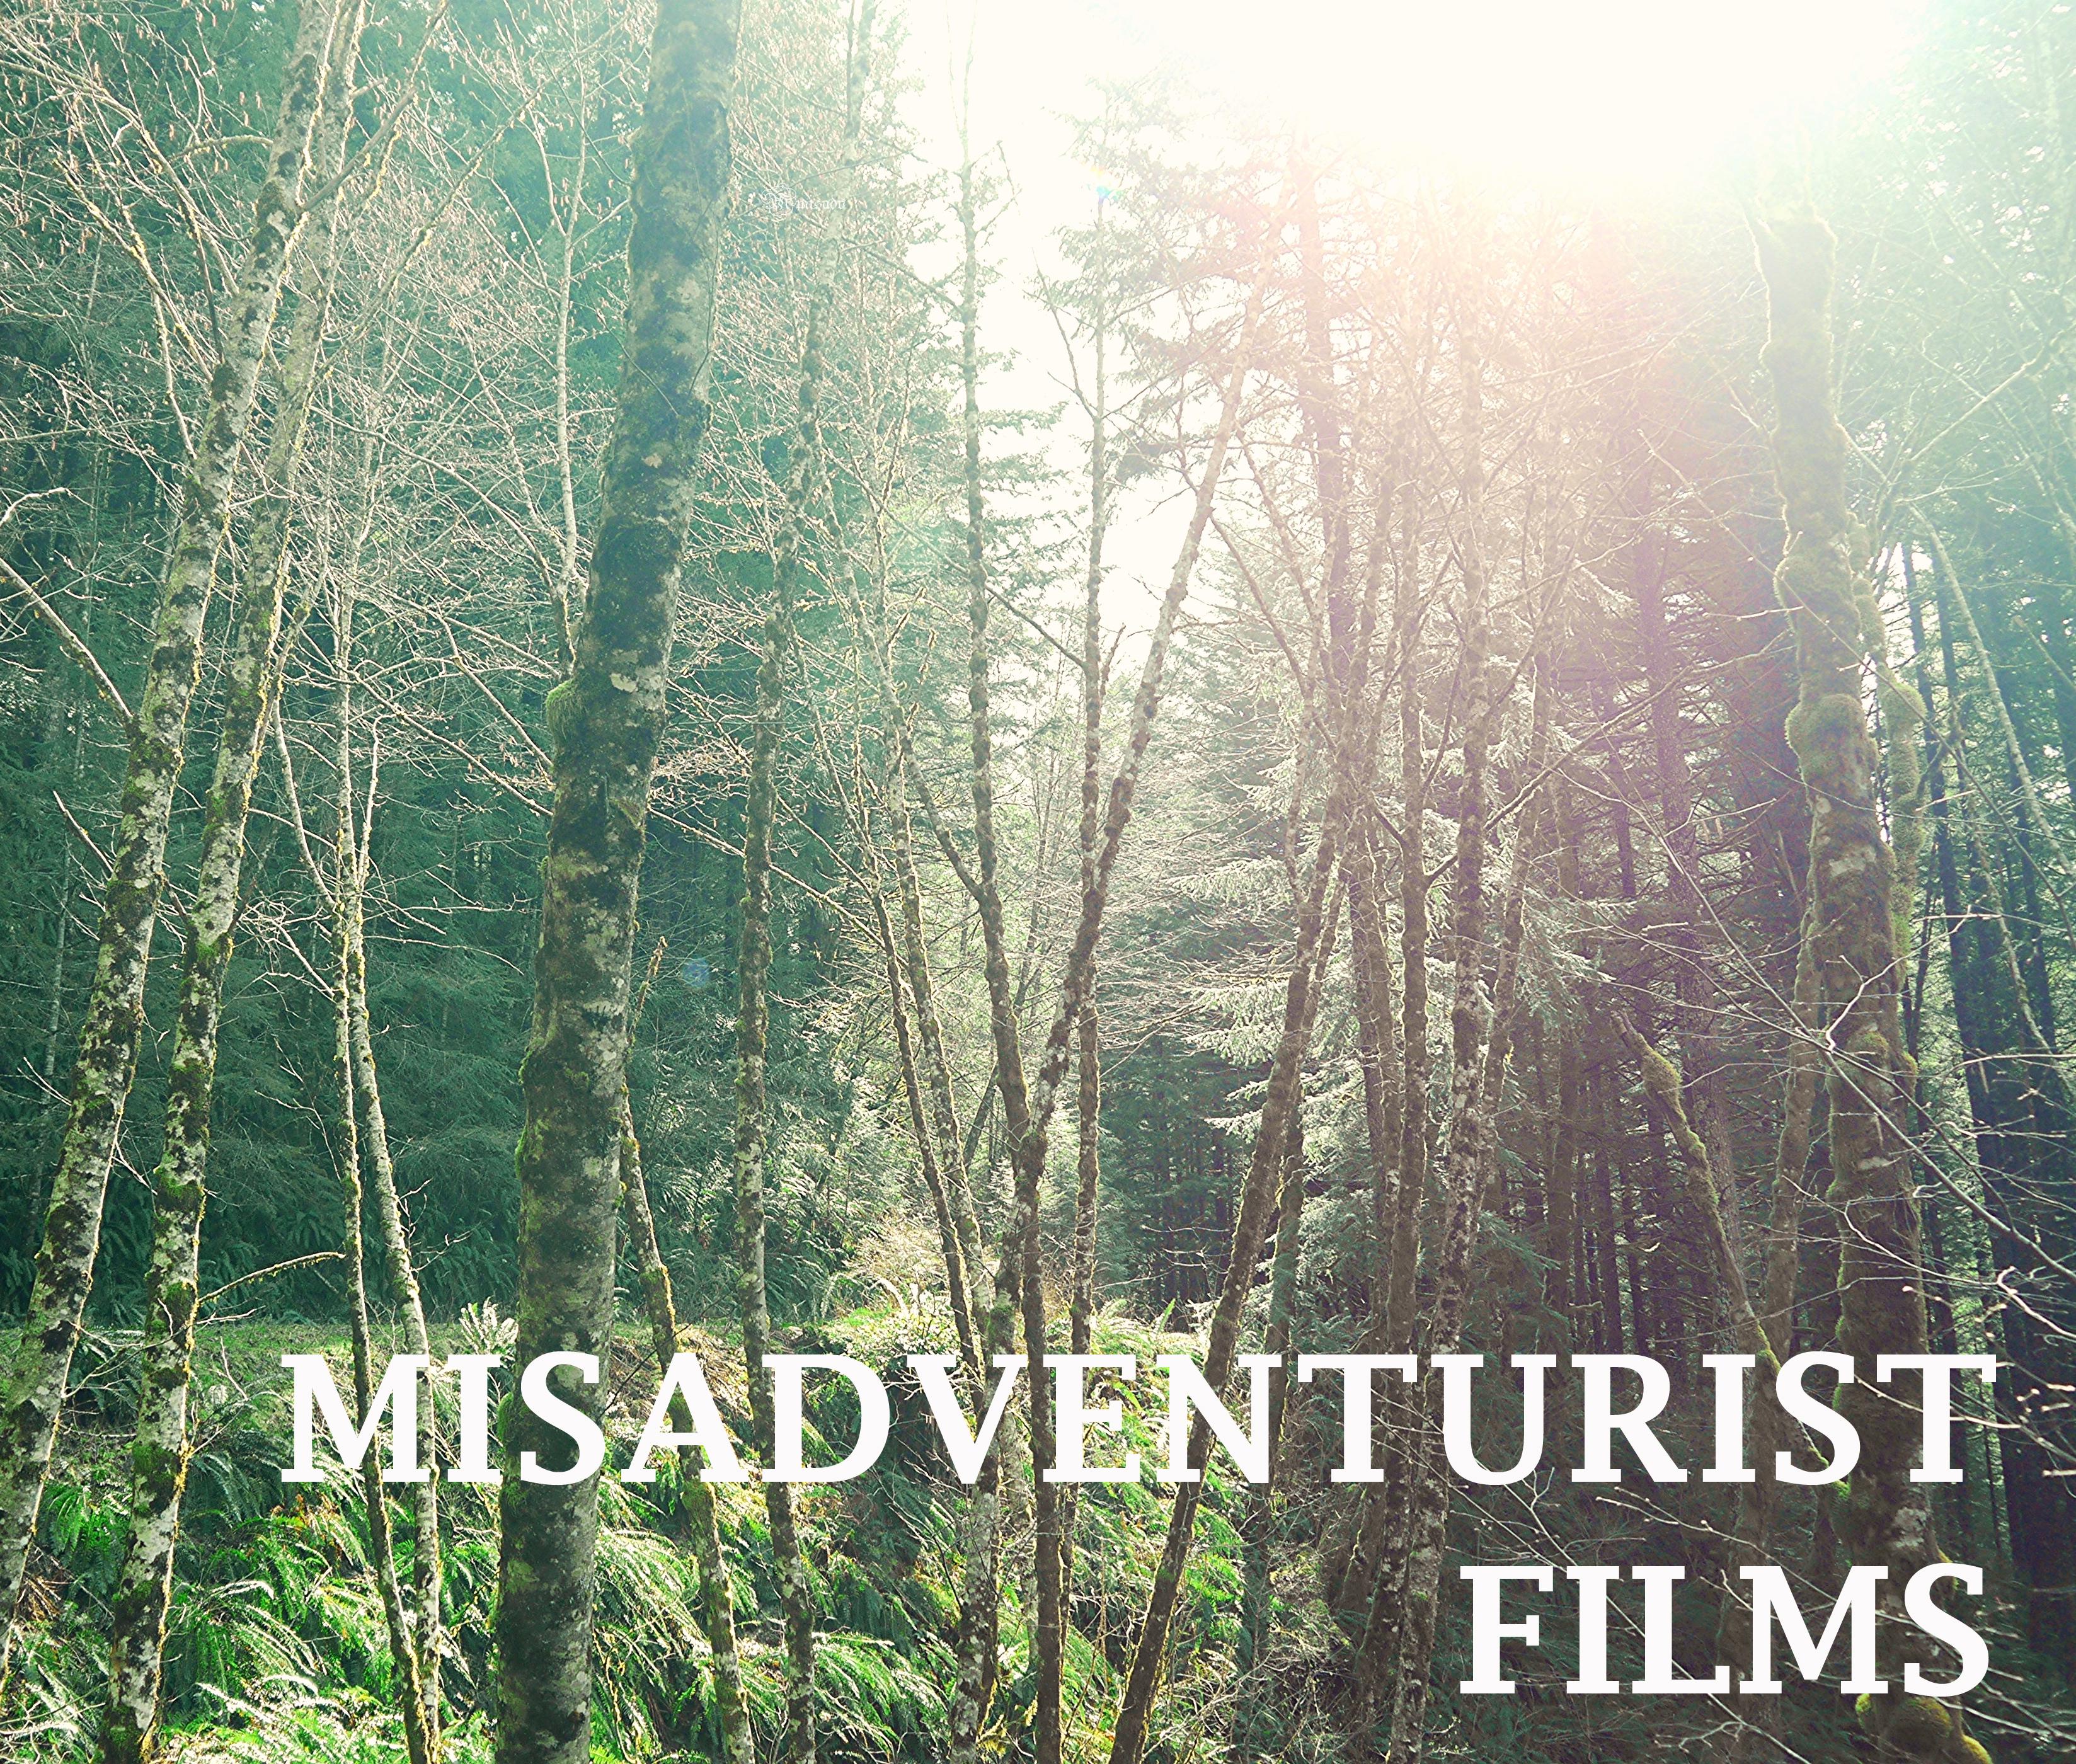 MISADVENTURIST FILMS